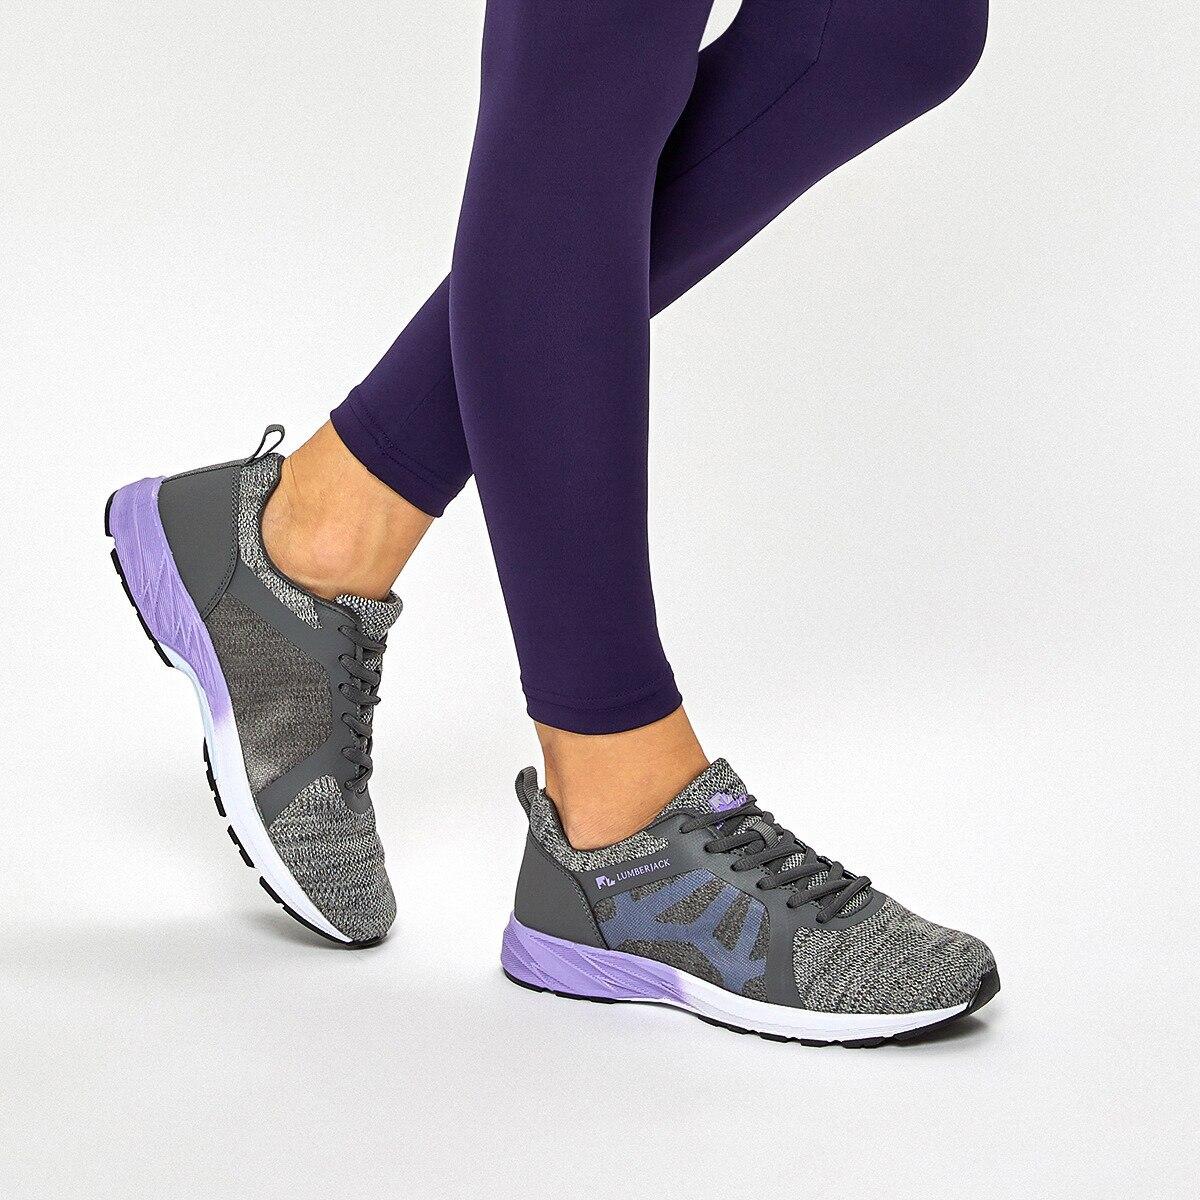 FLO GLINK 9PR Dark Gray Women 'S Running Shoe LUMBERJACK